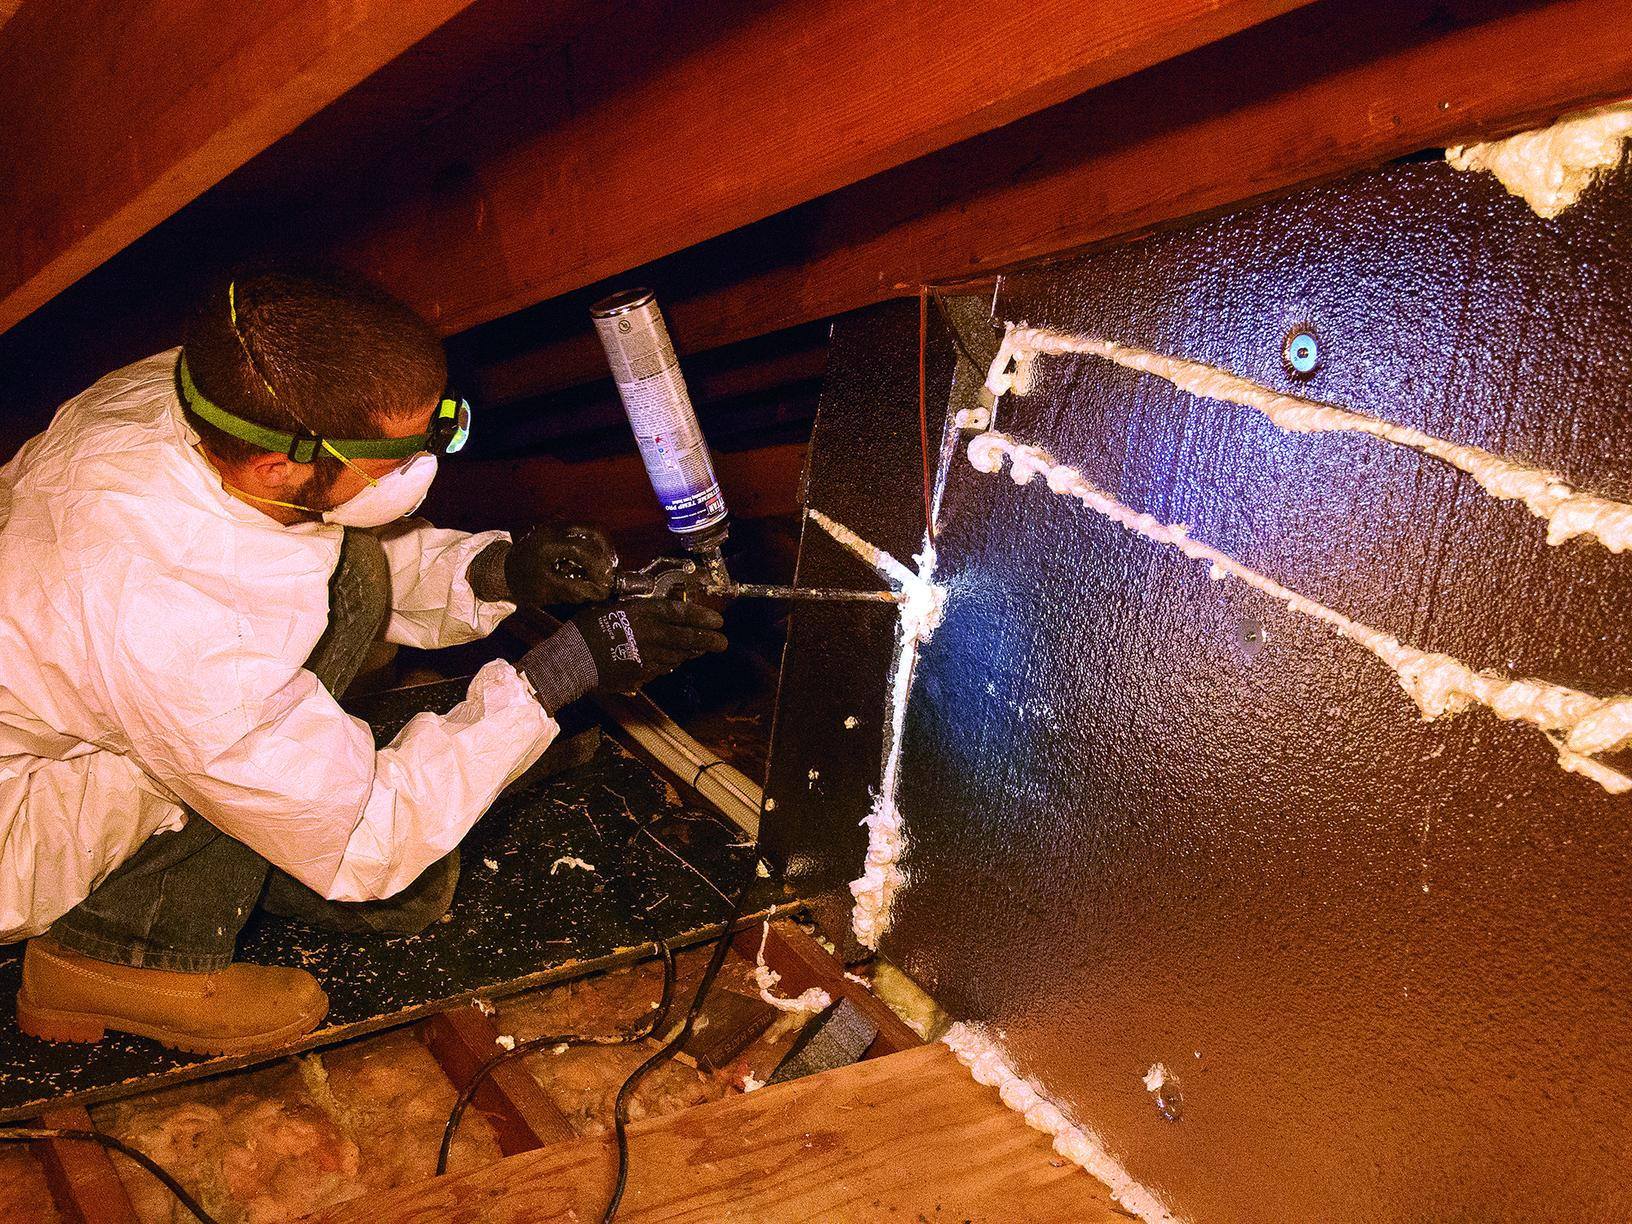 Sealing rigid foam insulation seams